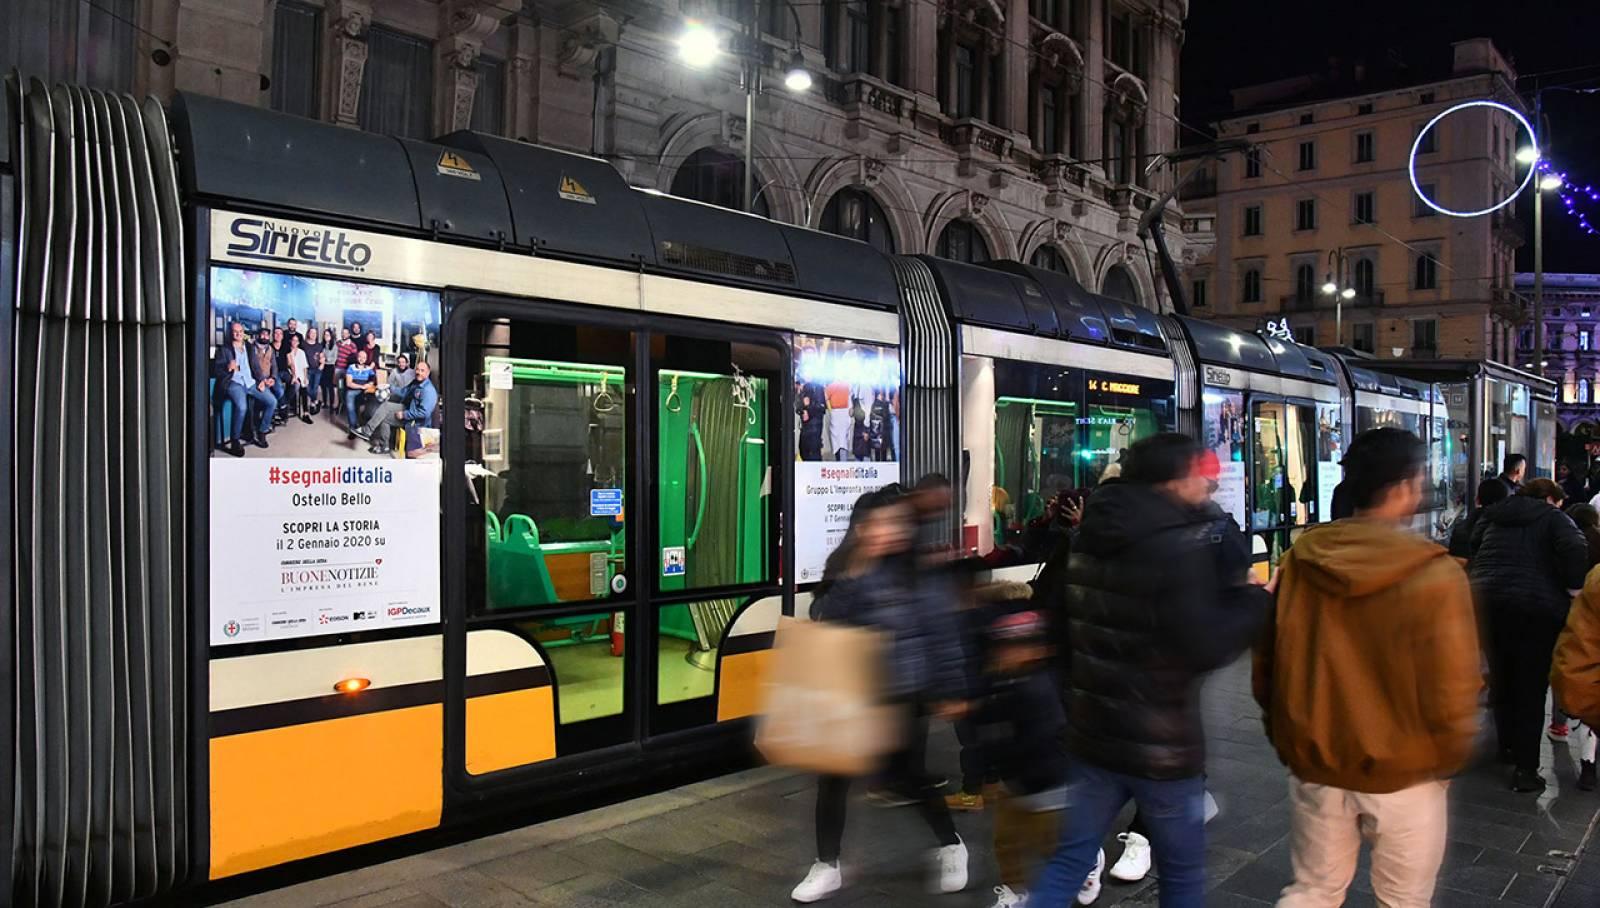 OOH IGPDecaux Milano pubblicità sui tram manyside per Segnali d'Italia